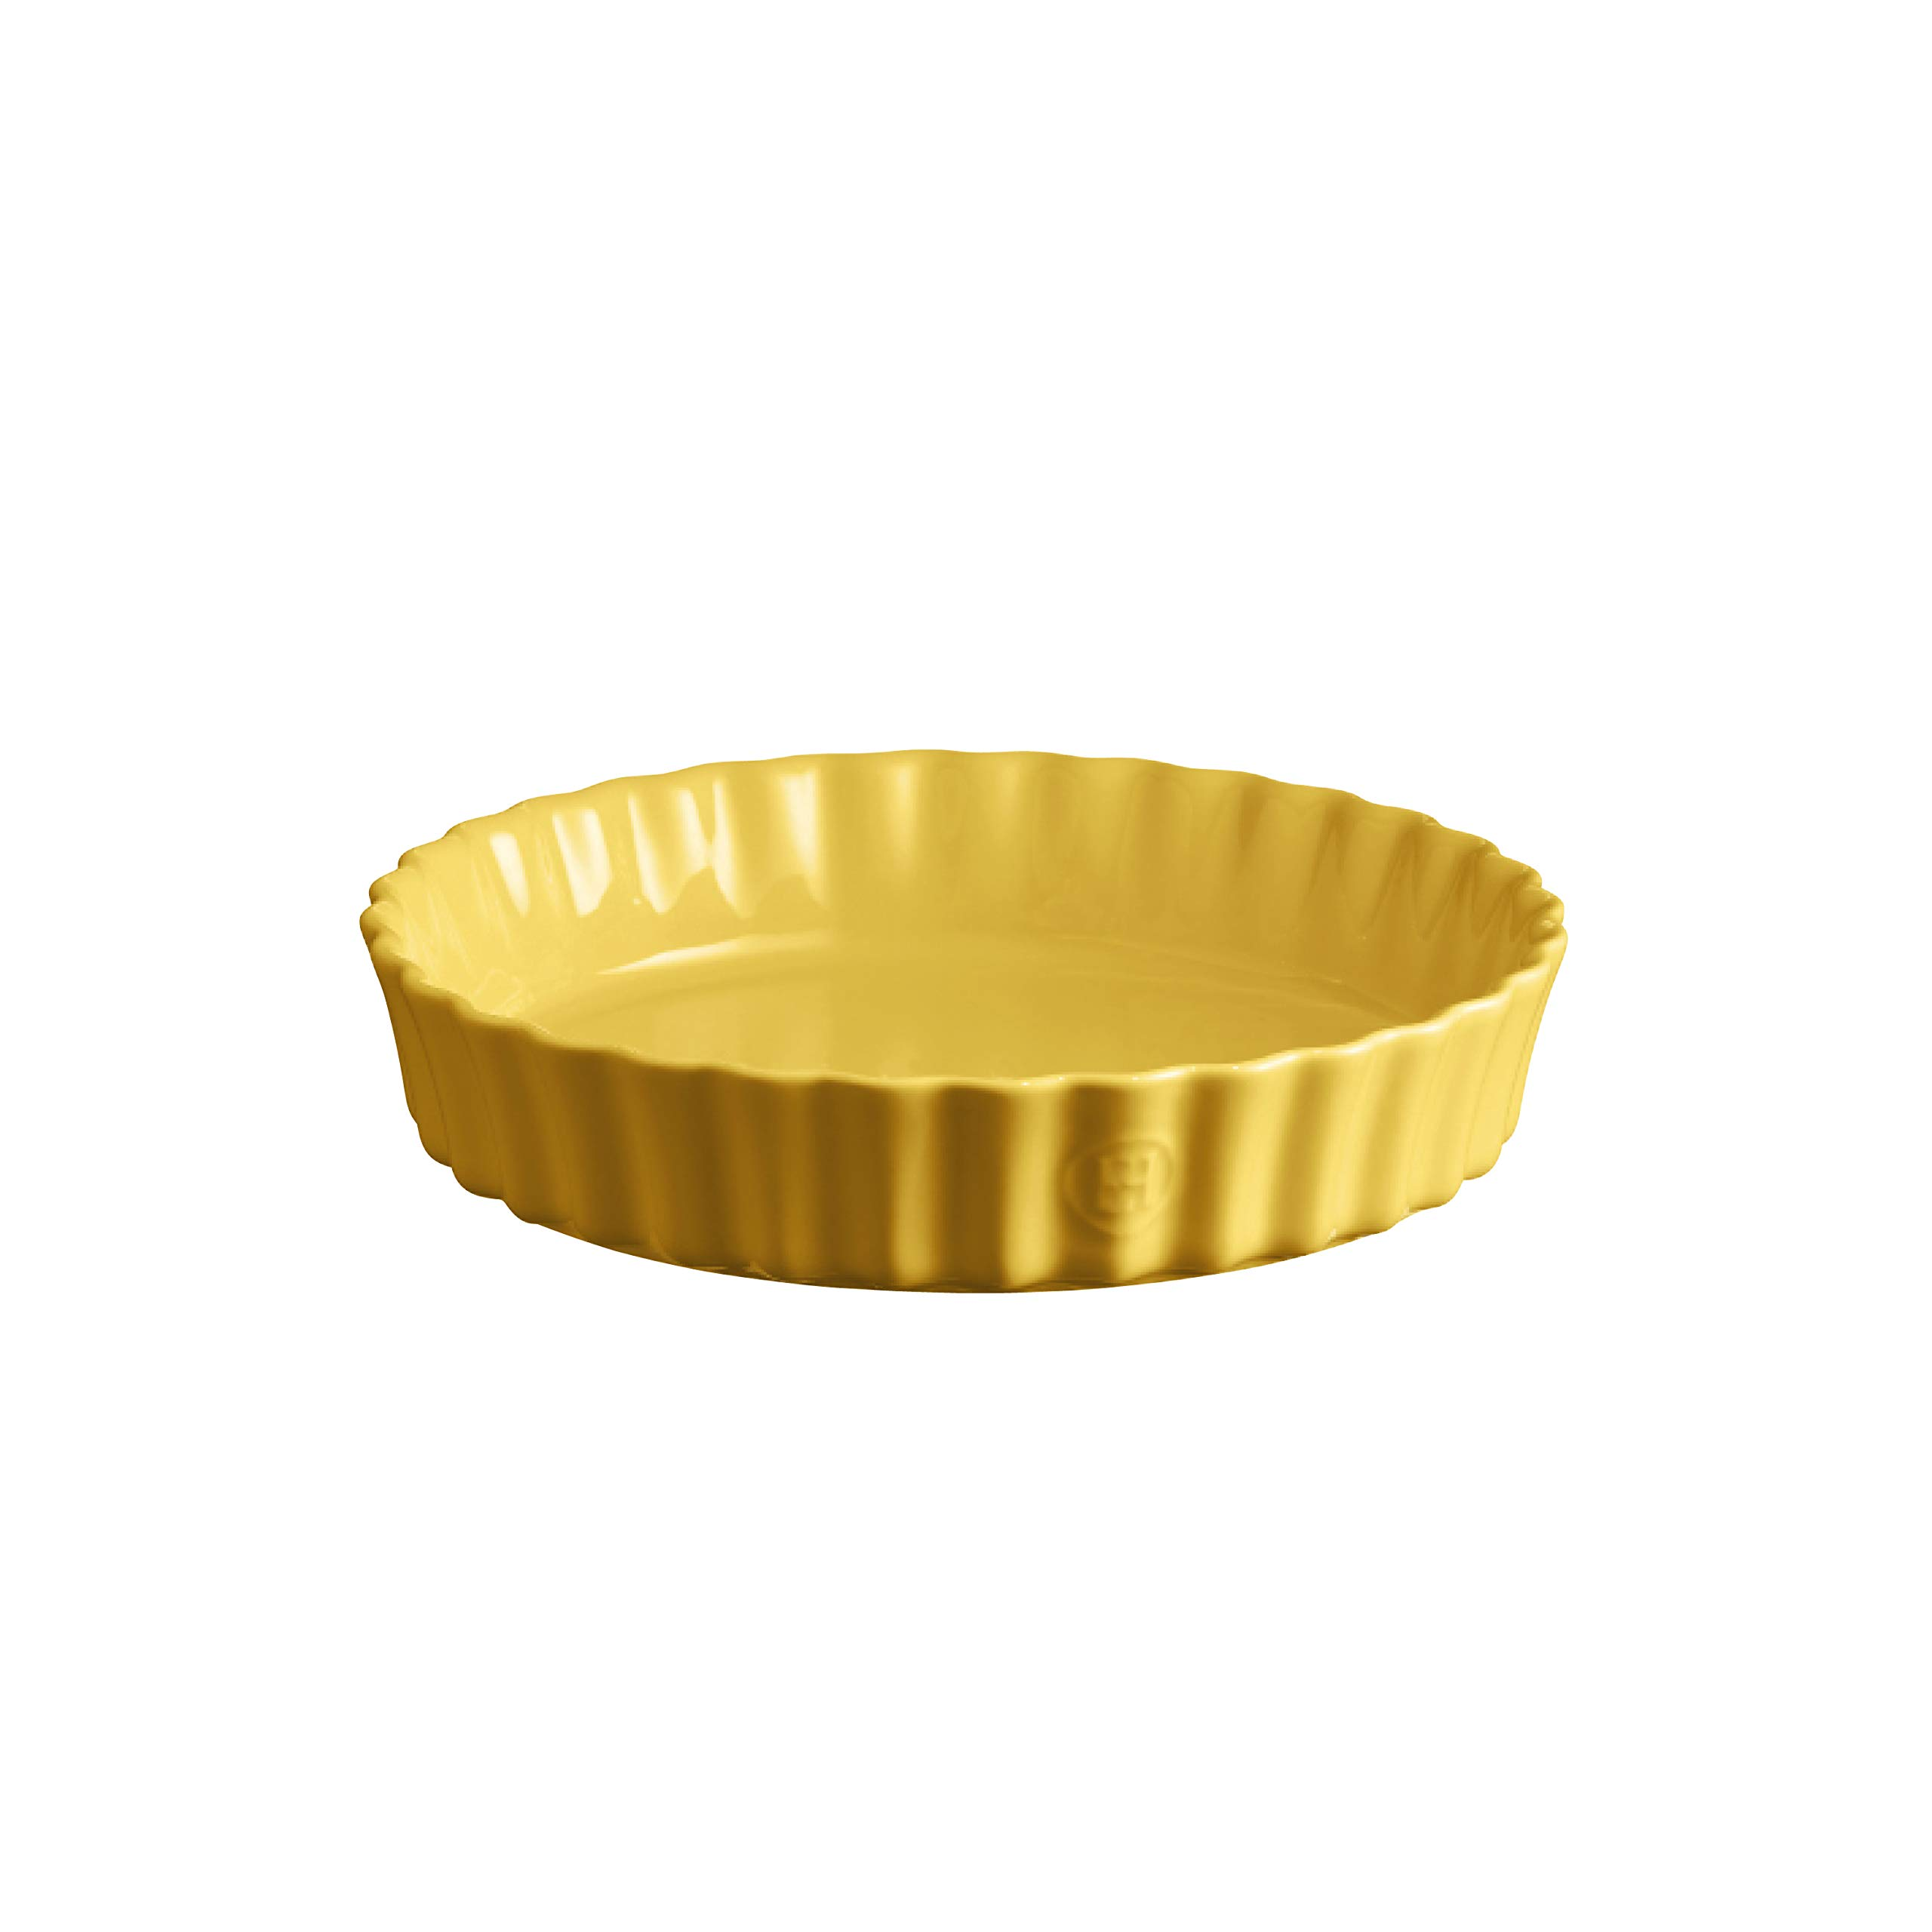 Emile Henry 906024 Deep Flan, Provence Yellow Quiche Dish, 1.2 qt,